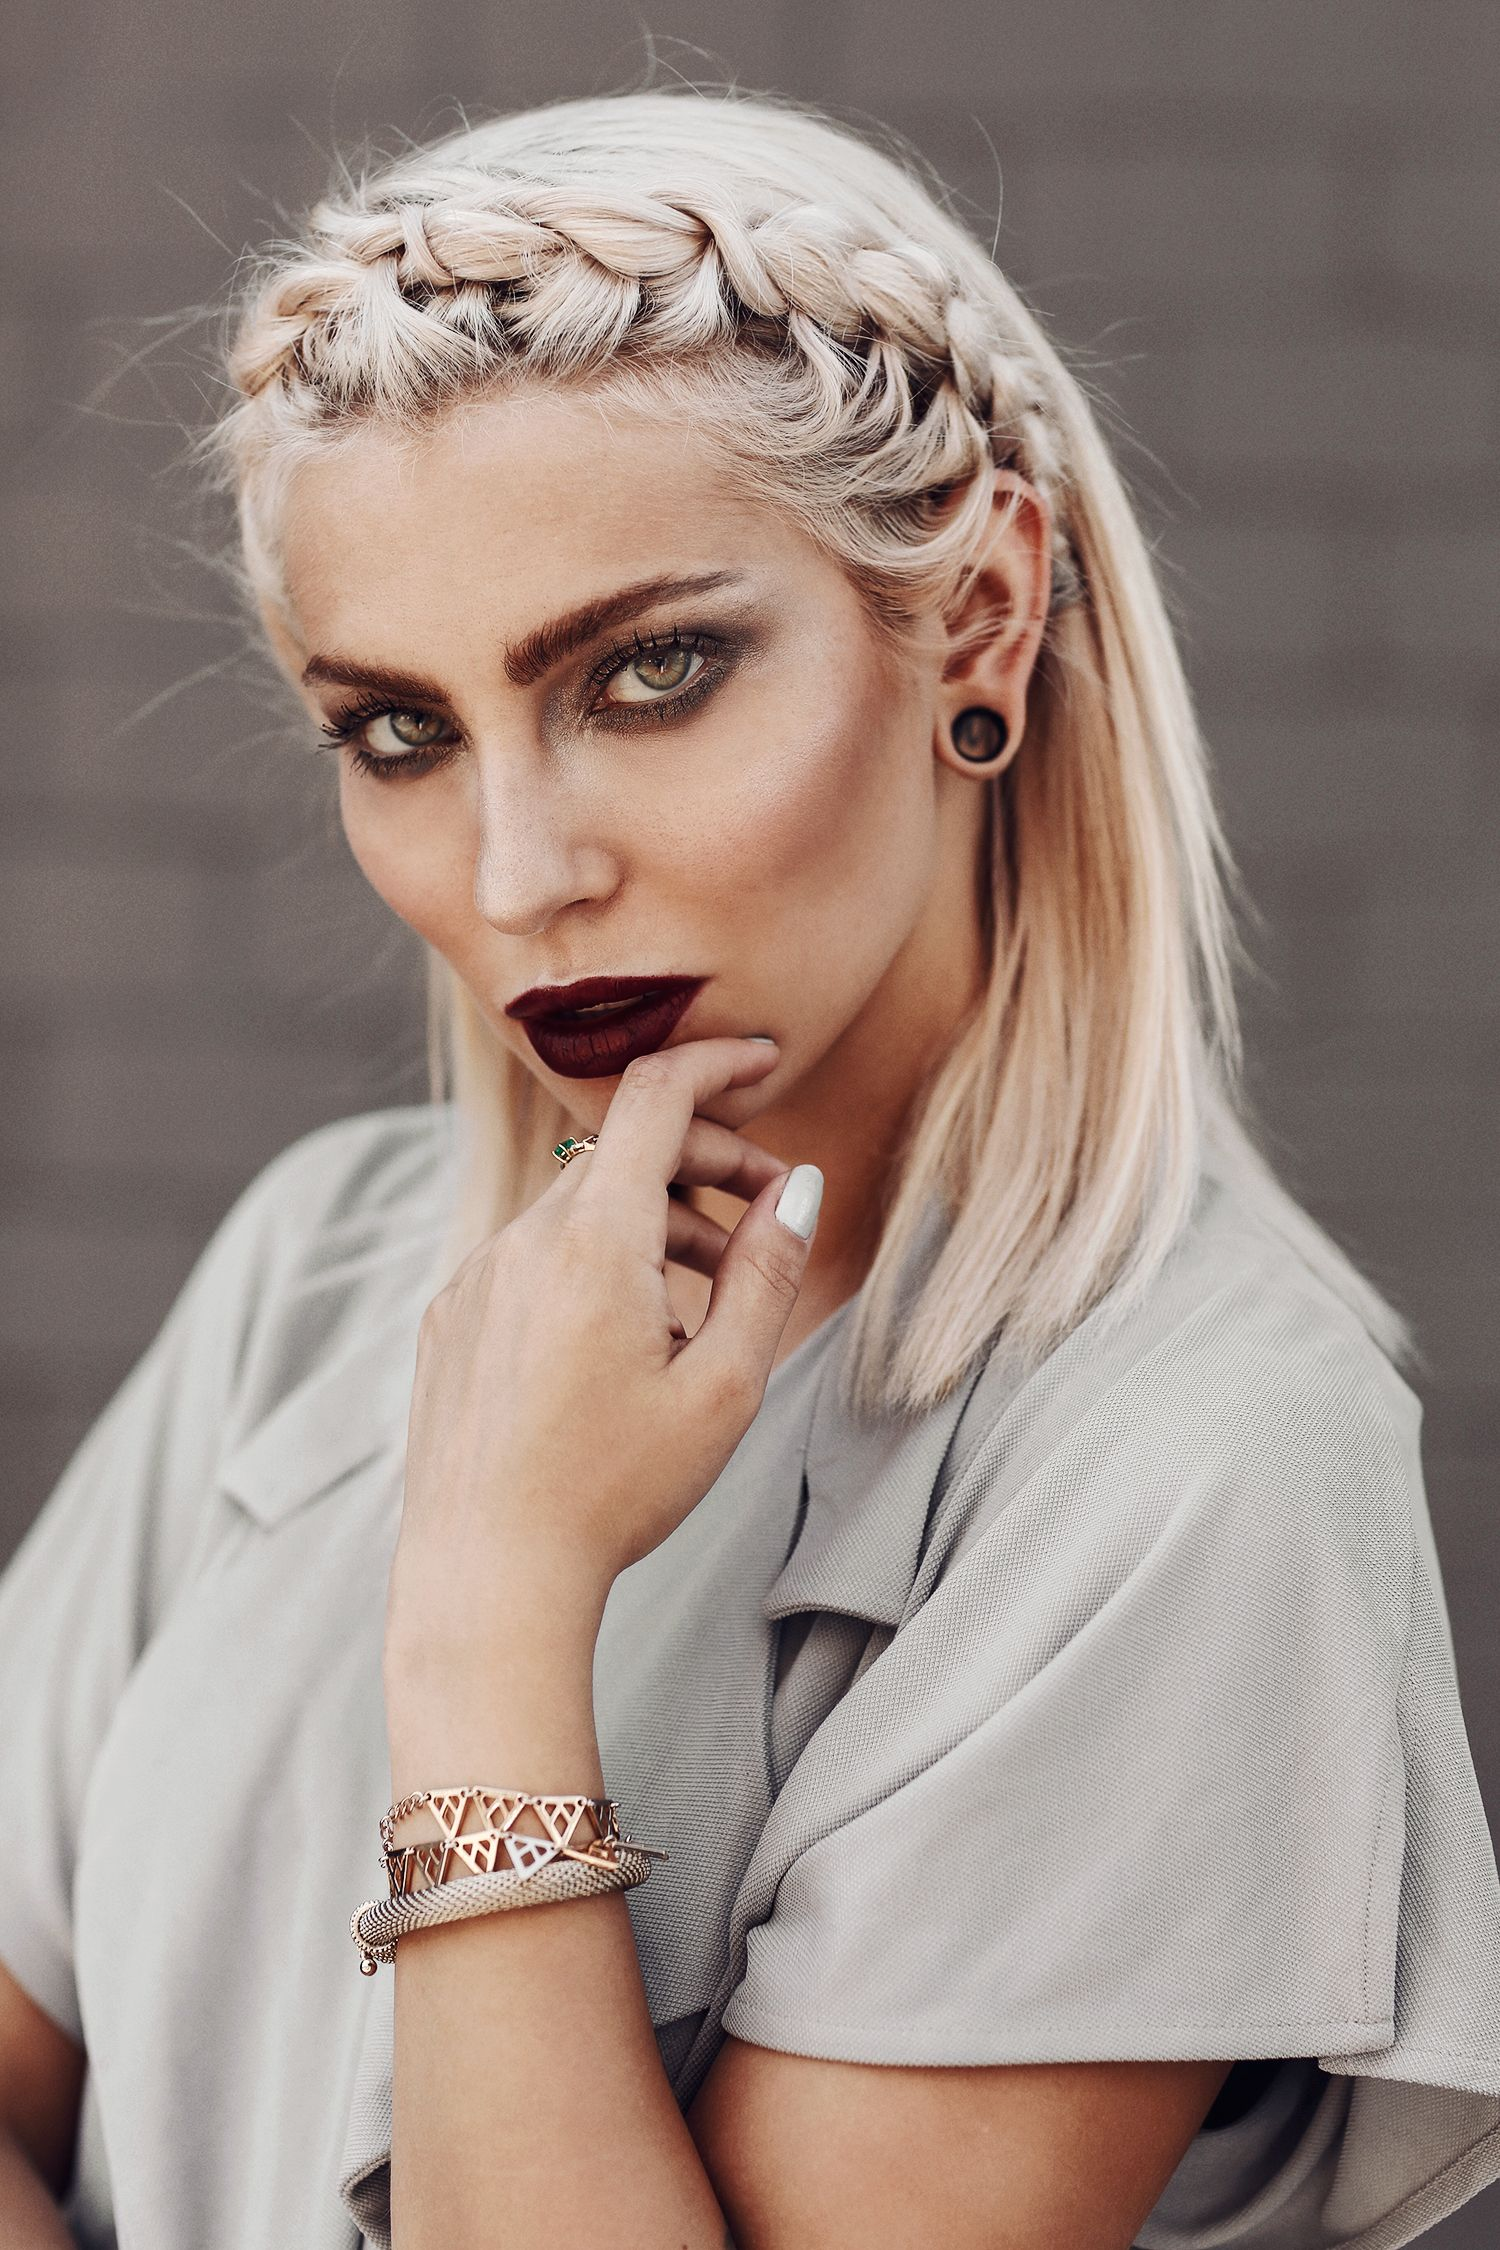 Masha Sedgwick Portrait